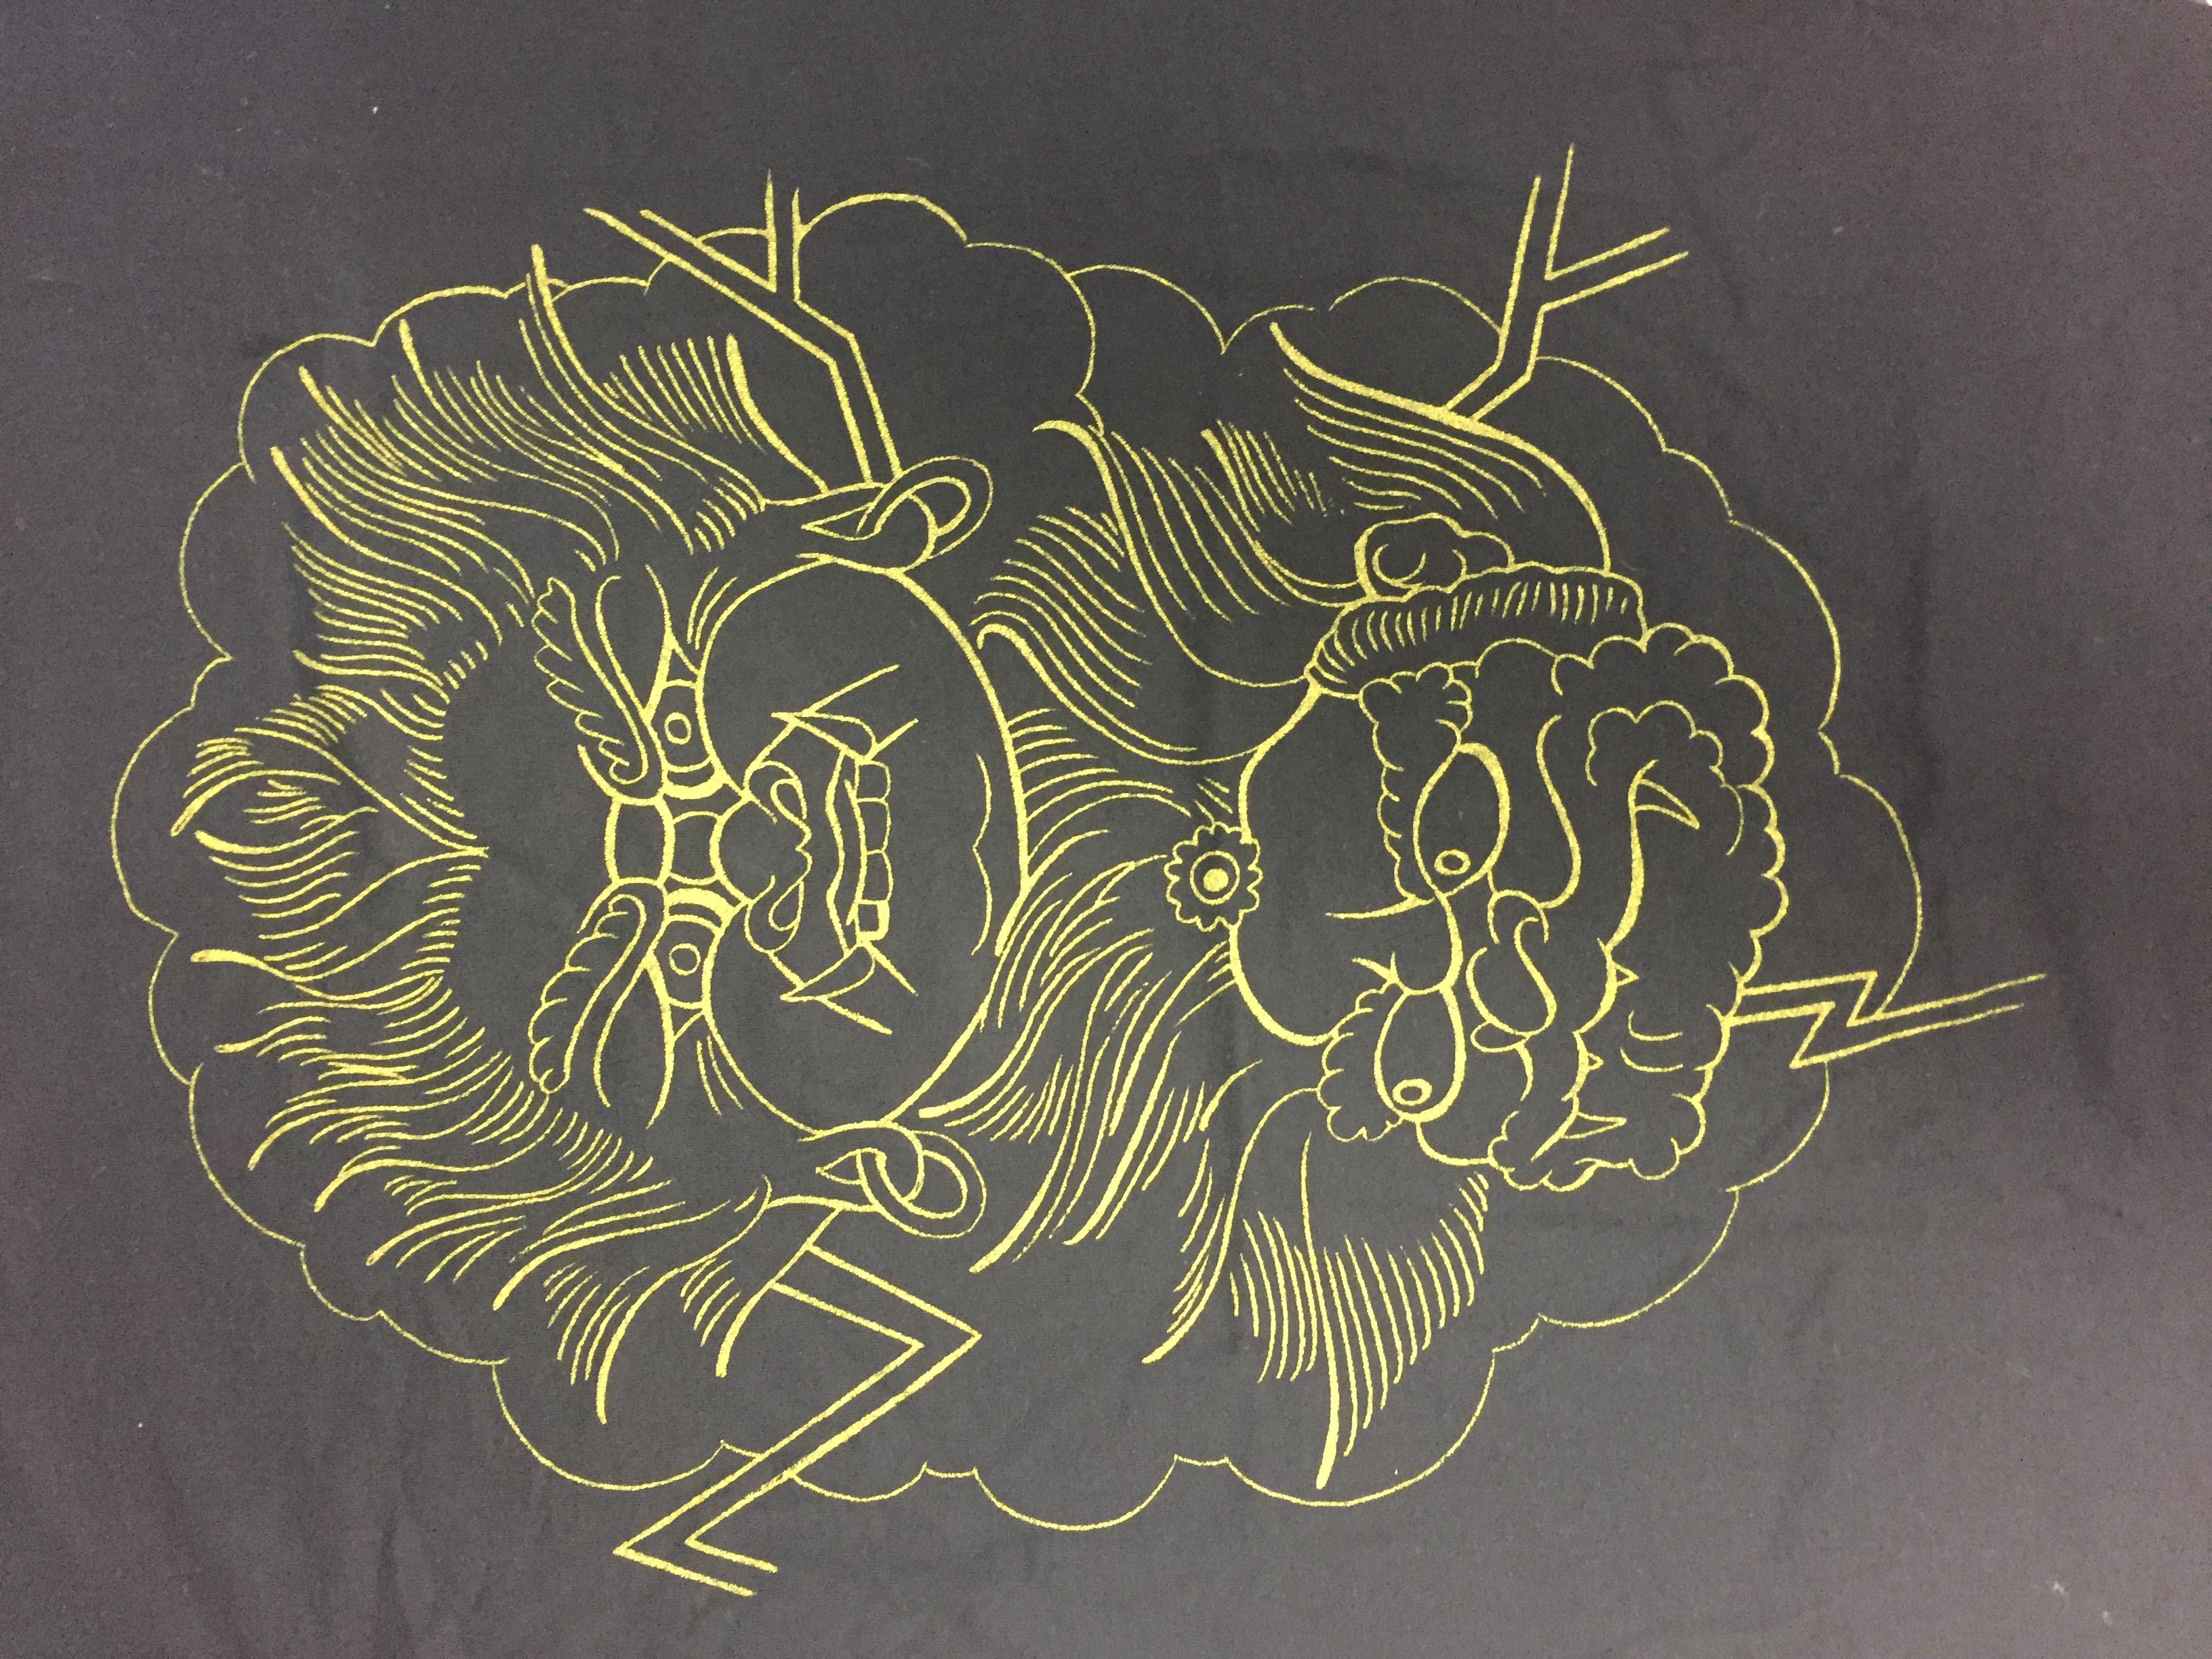 Tattooing by Yurkew: Minneapolis' First Tattoo Shop